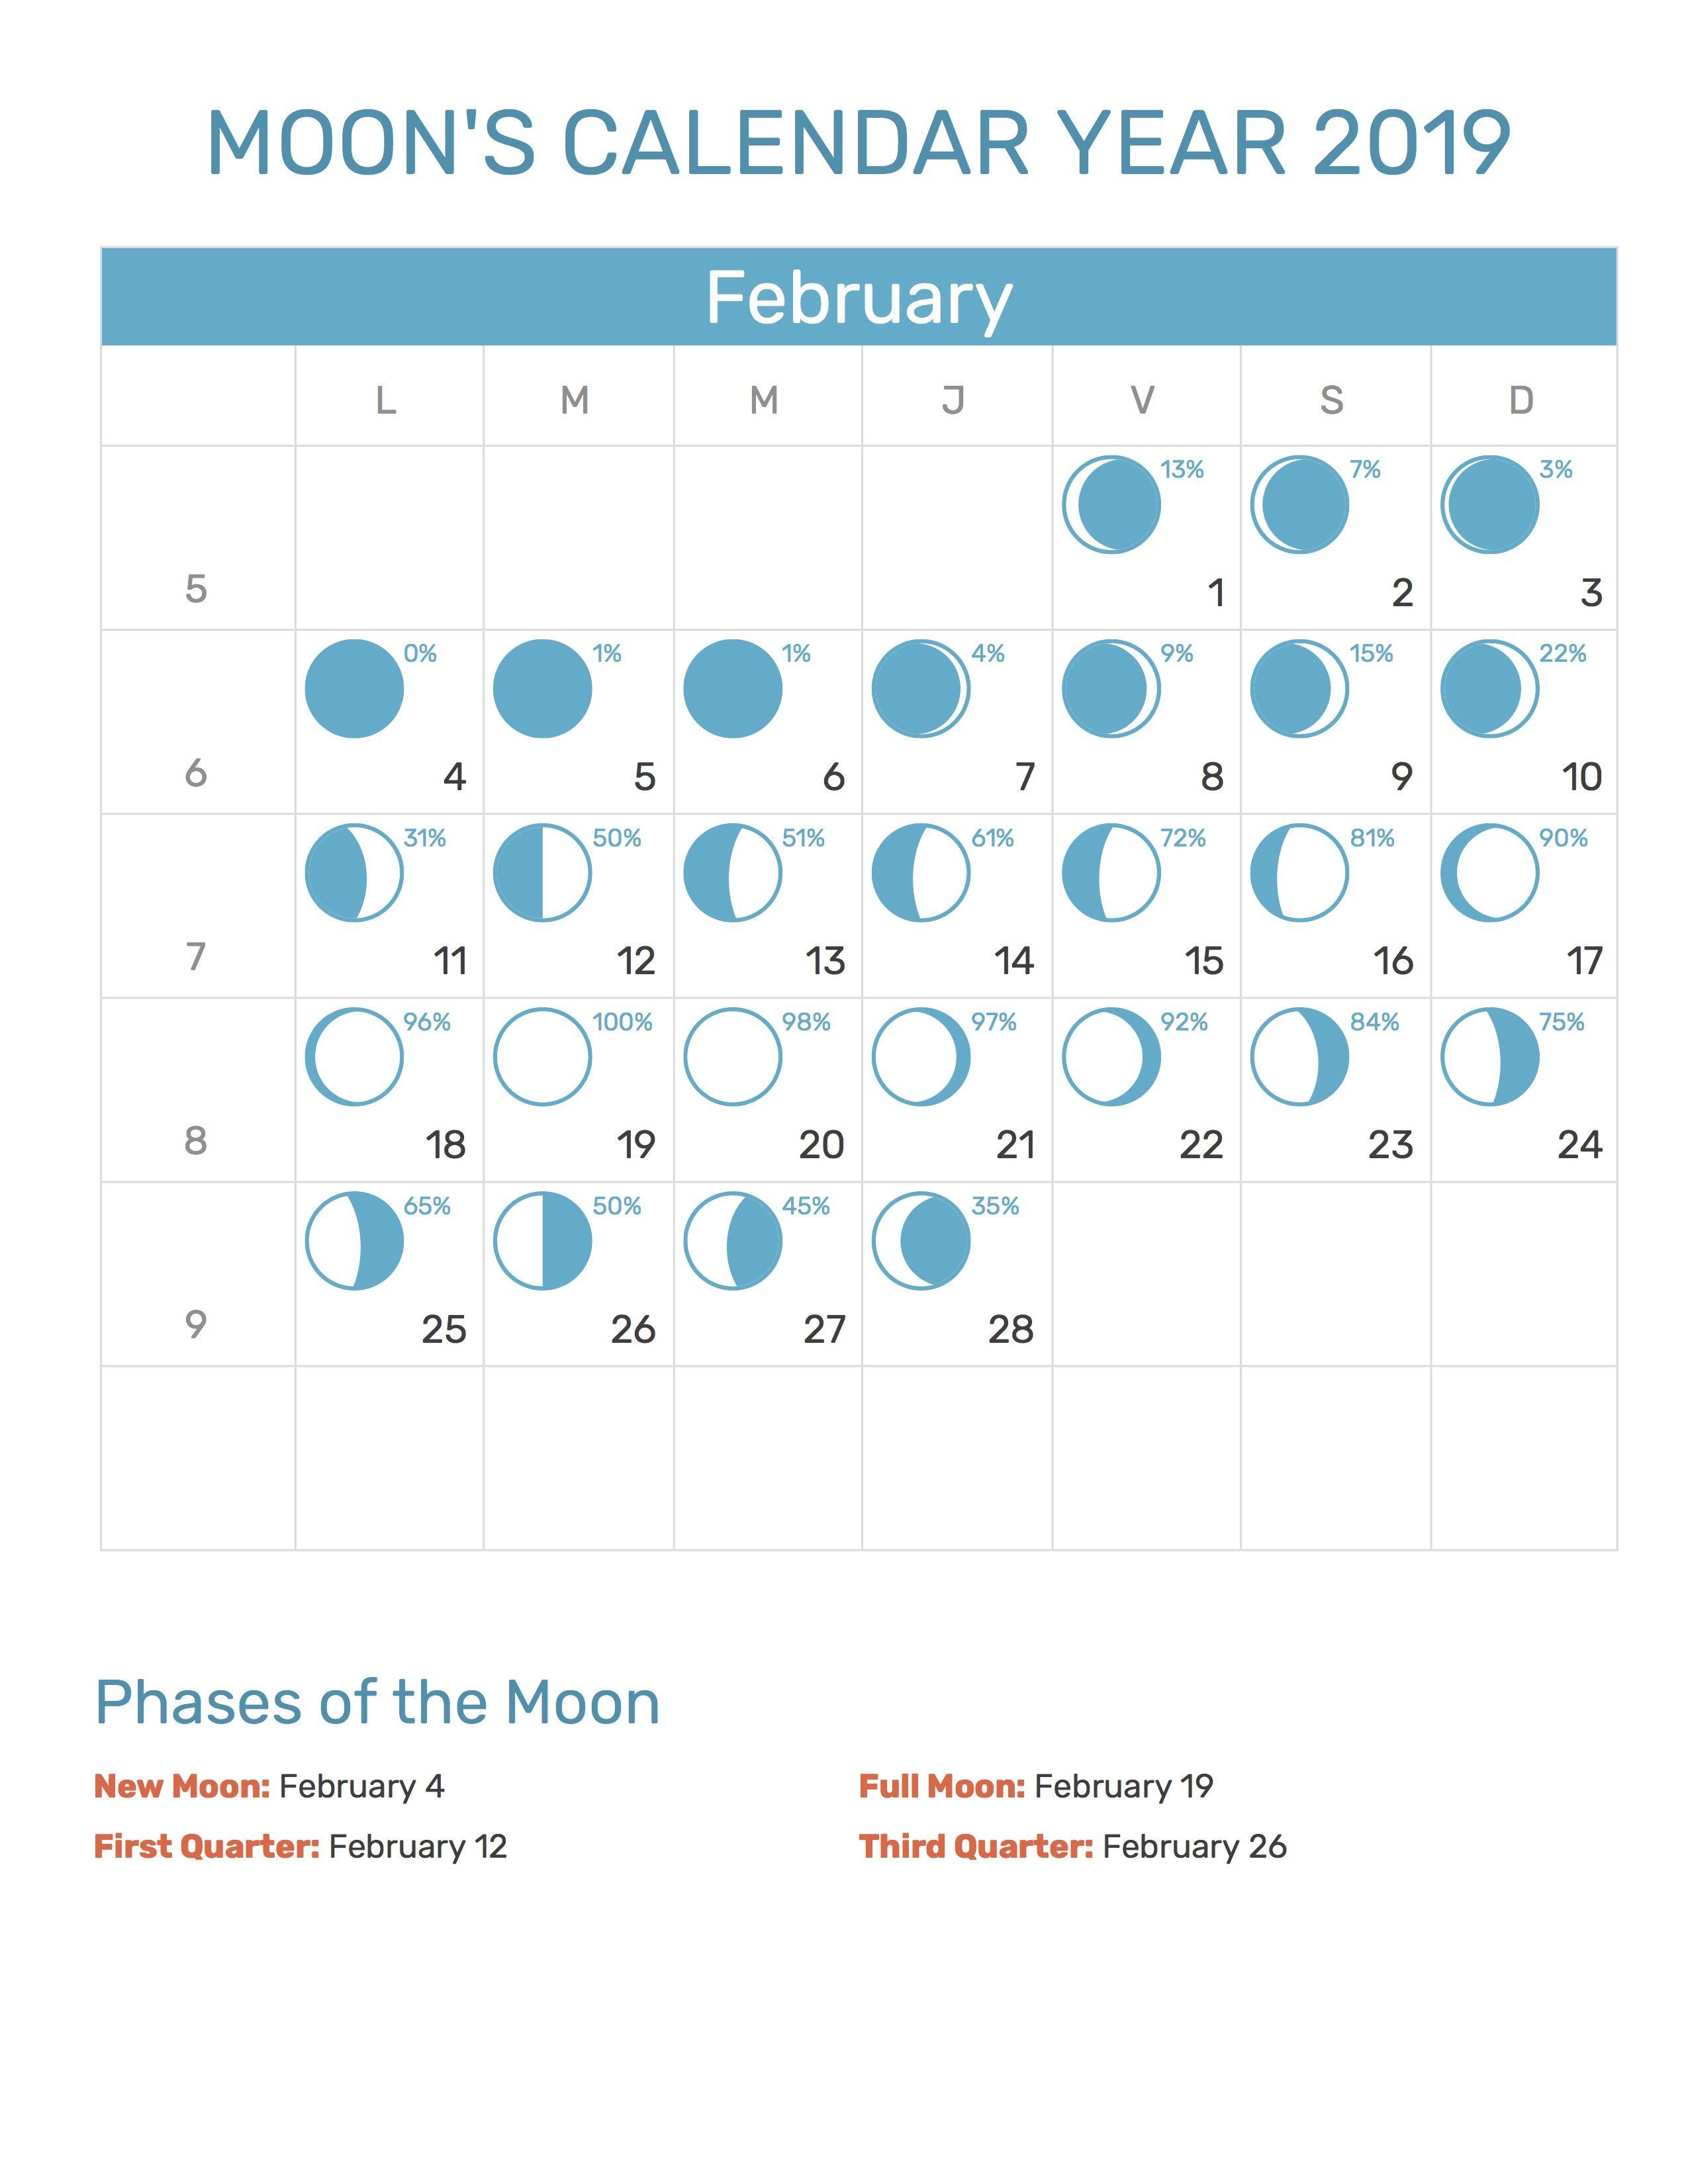 February 2019 Moon Calendar Moon Calendar February 2019 #February #FebruaryCalendar